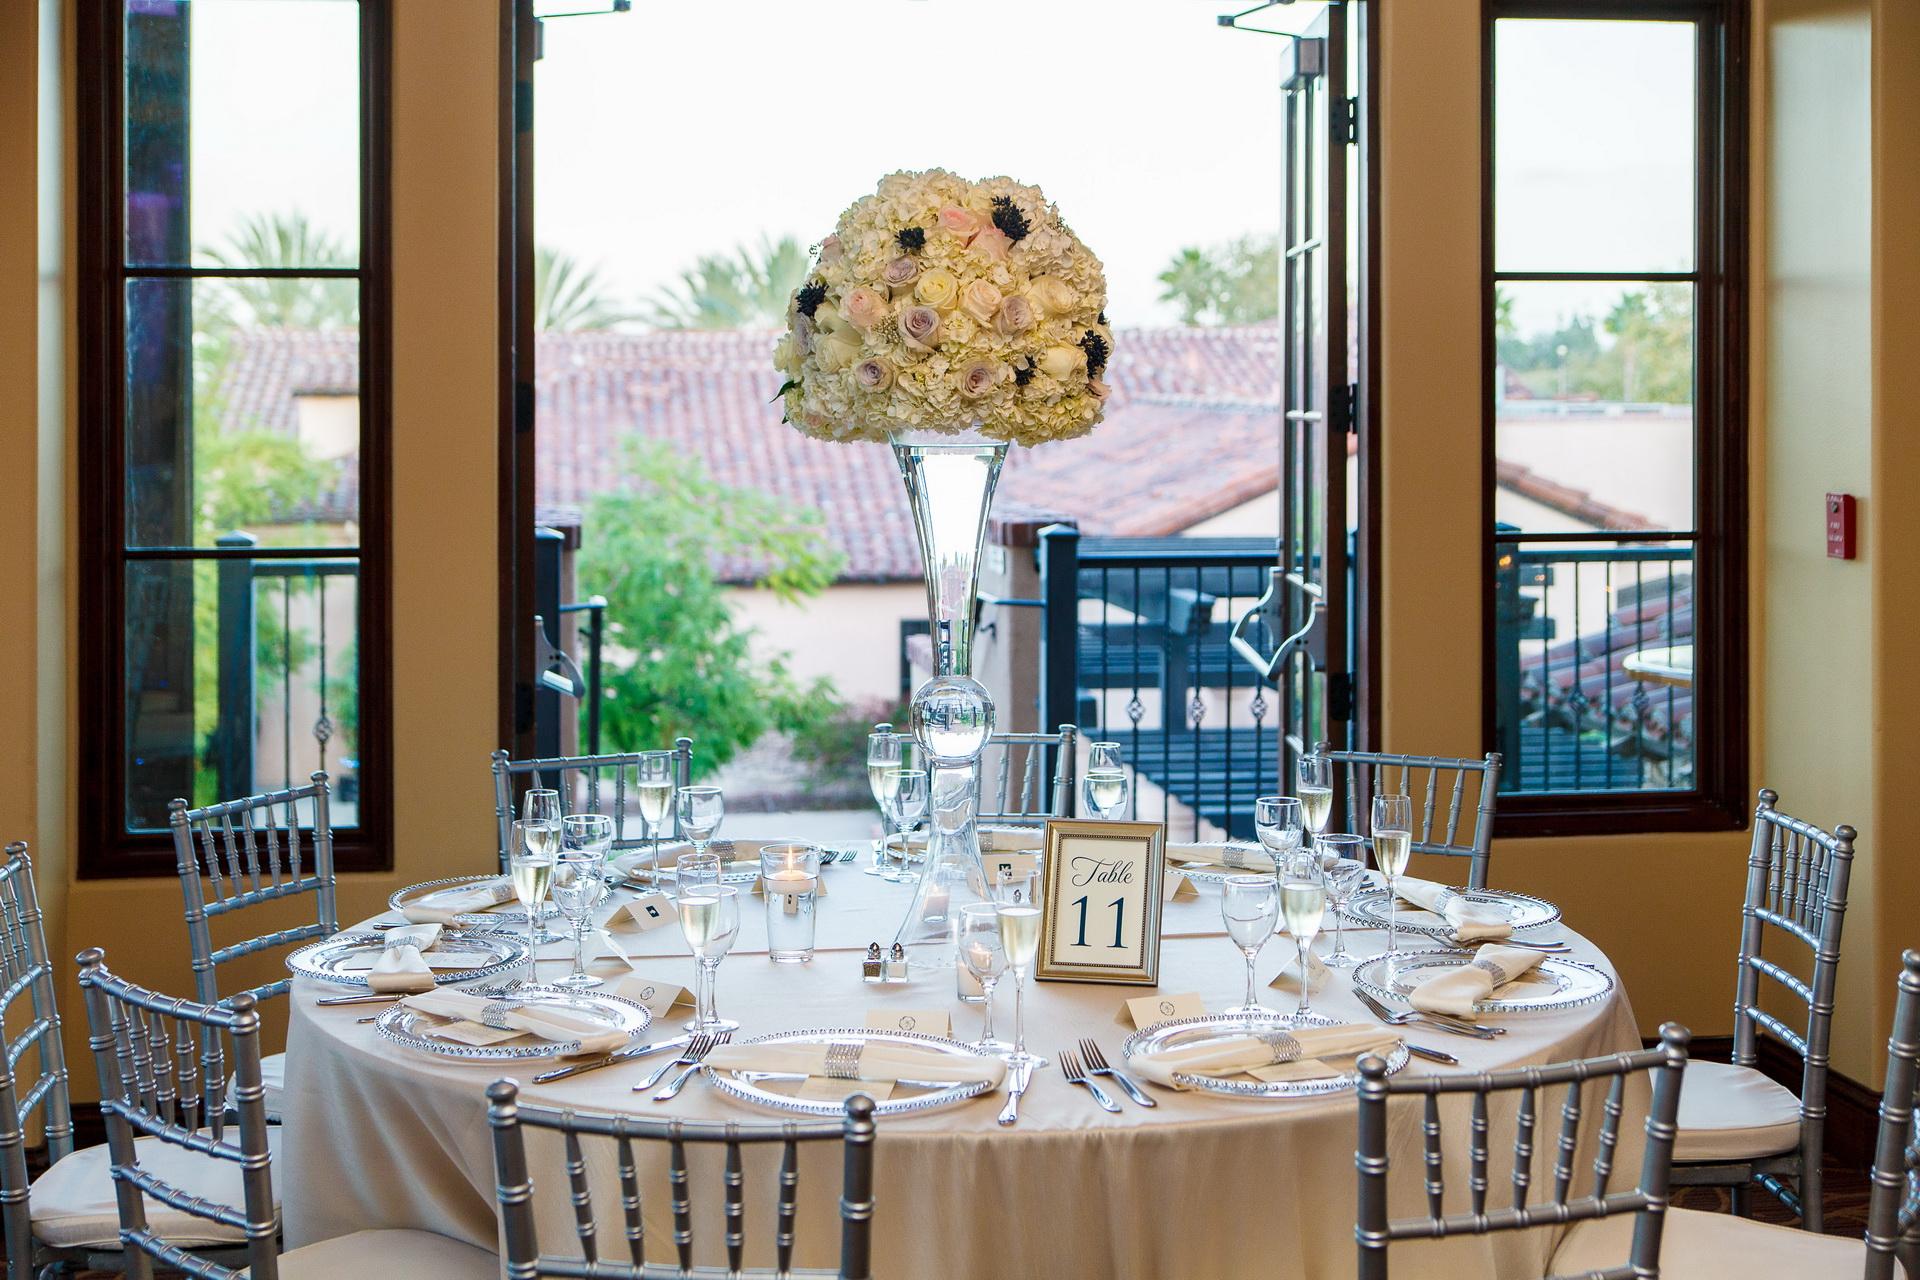 Round Table Aliso Viejo.Aliso Viejo Country Club Weddings By Nicole Caldwell 89 Nicole